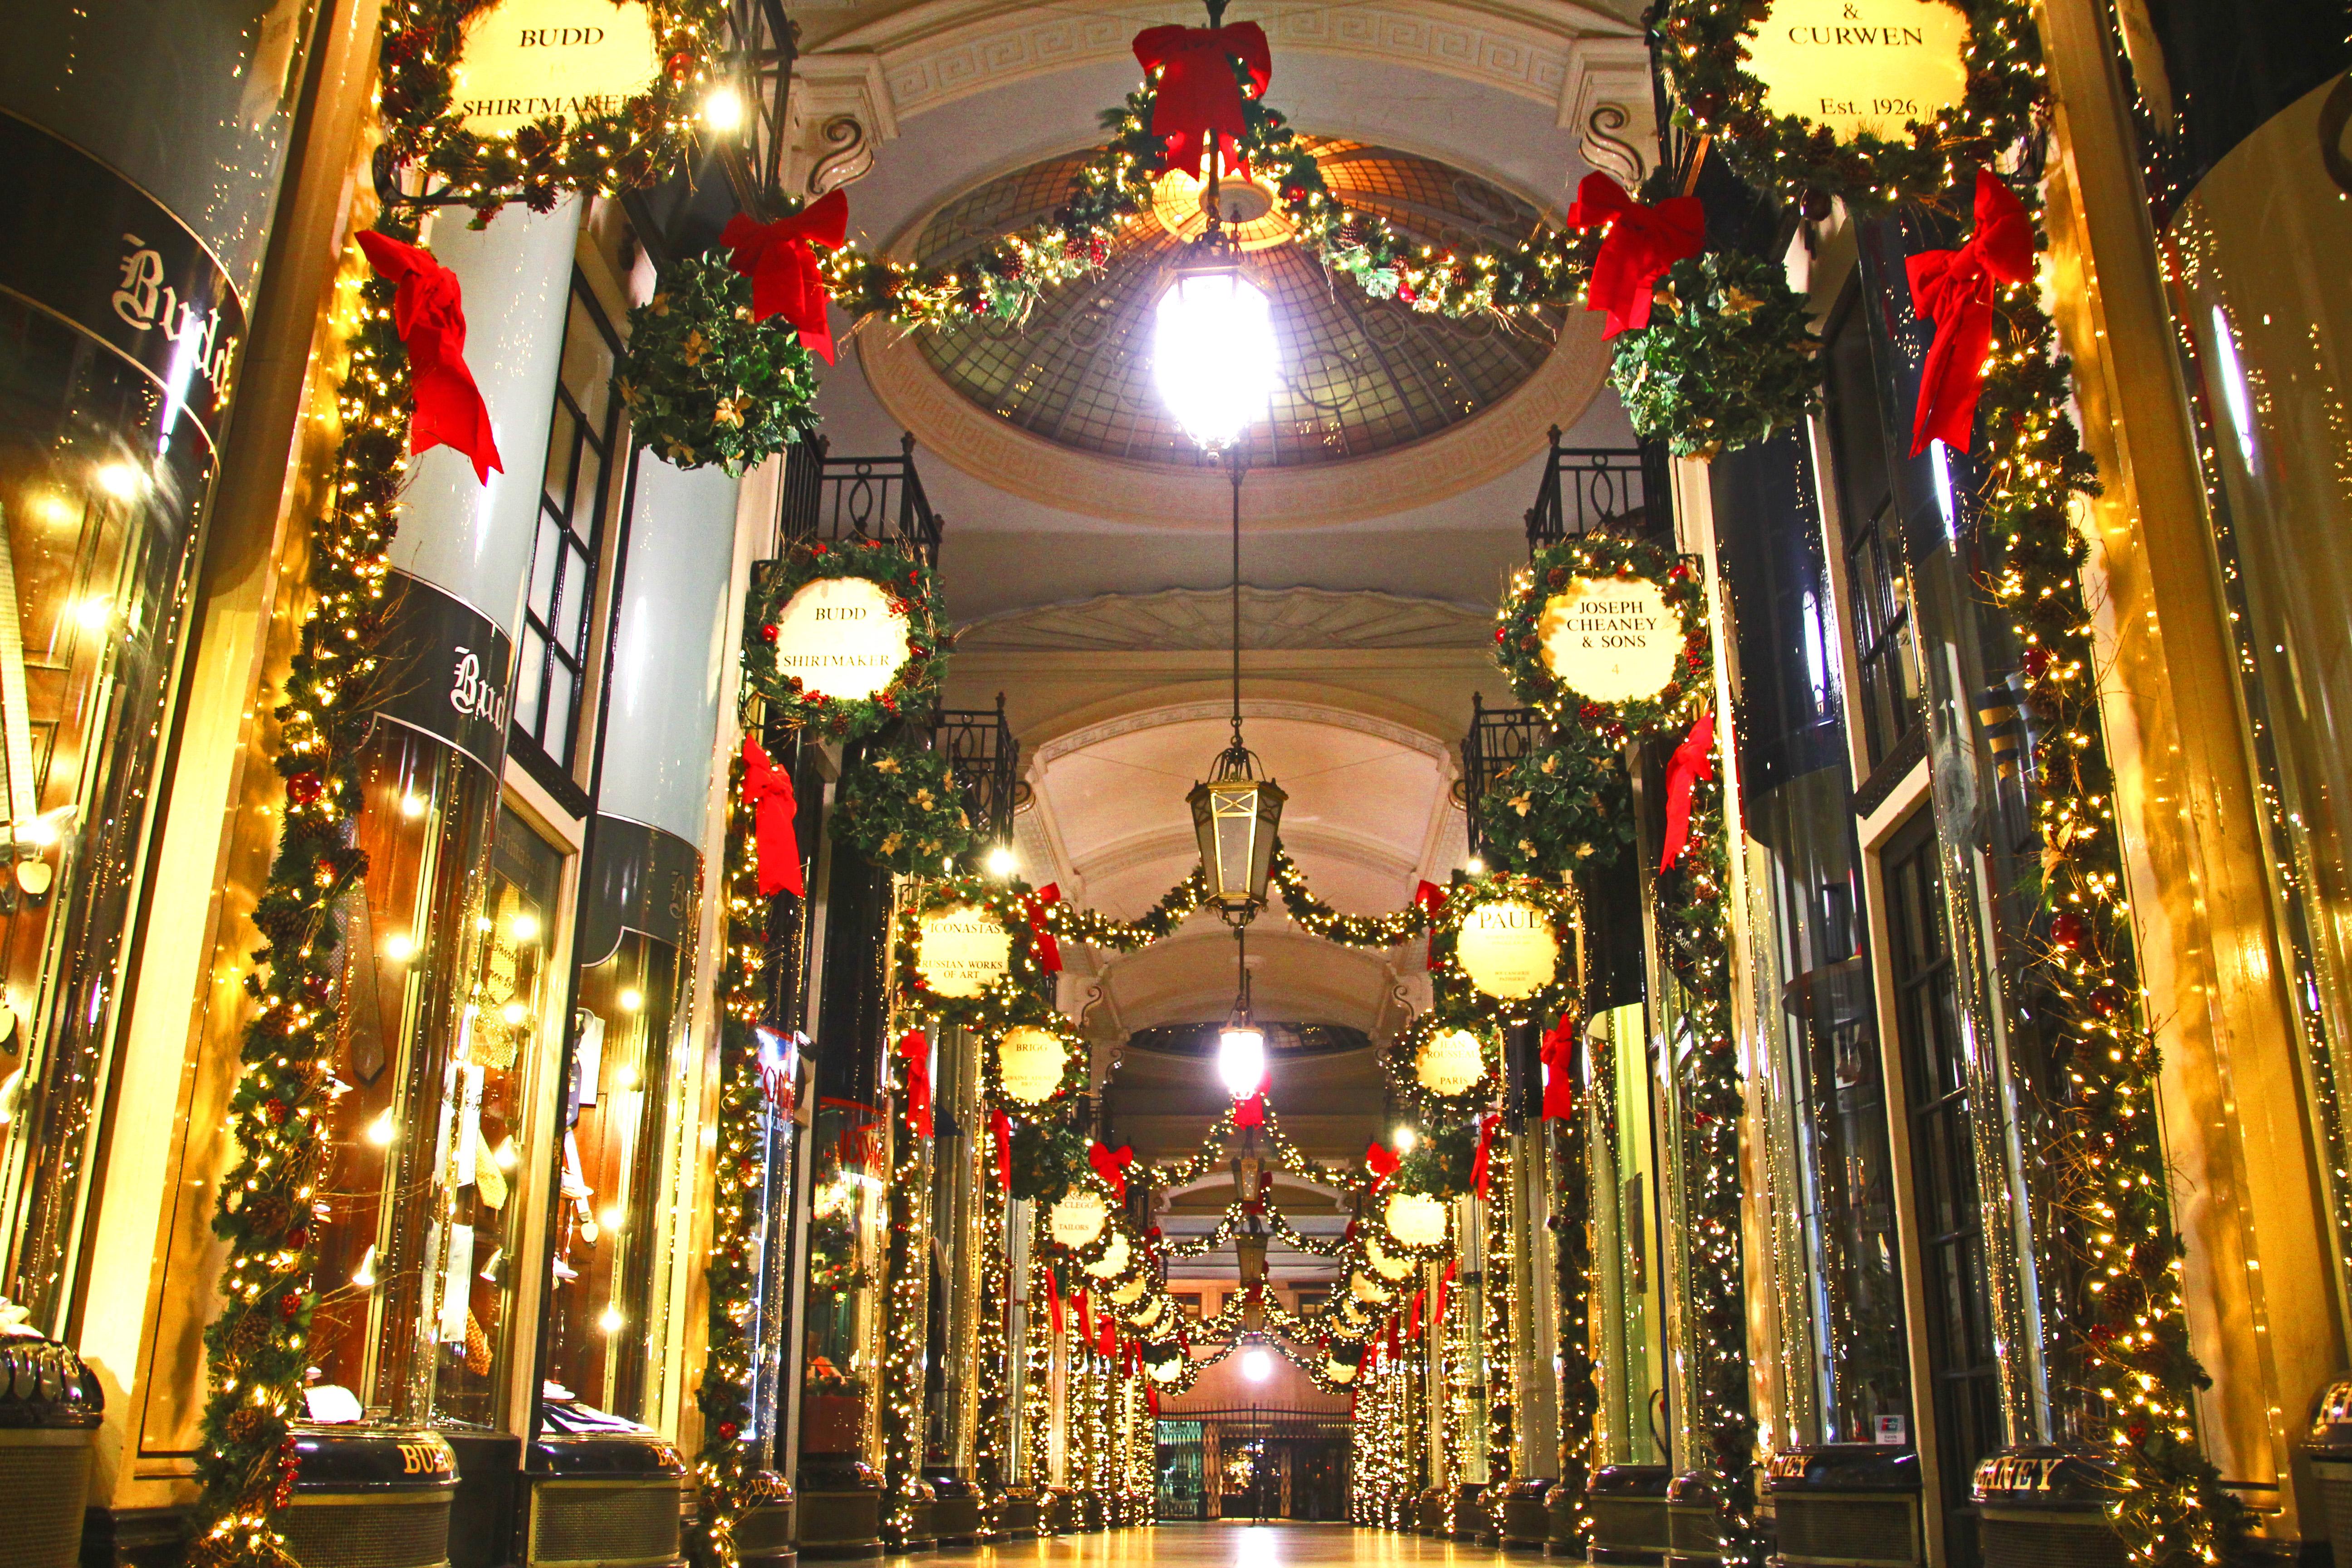 Burlington Arcade © jonovernon-powell